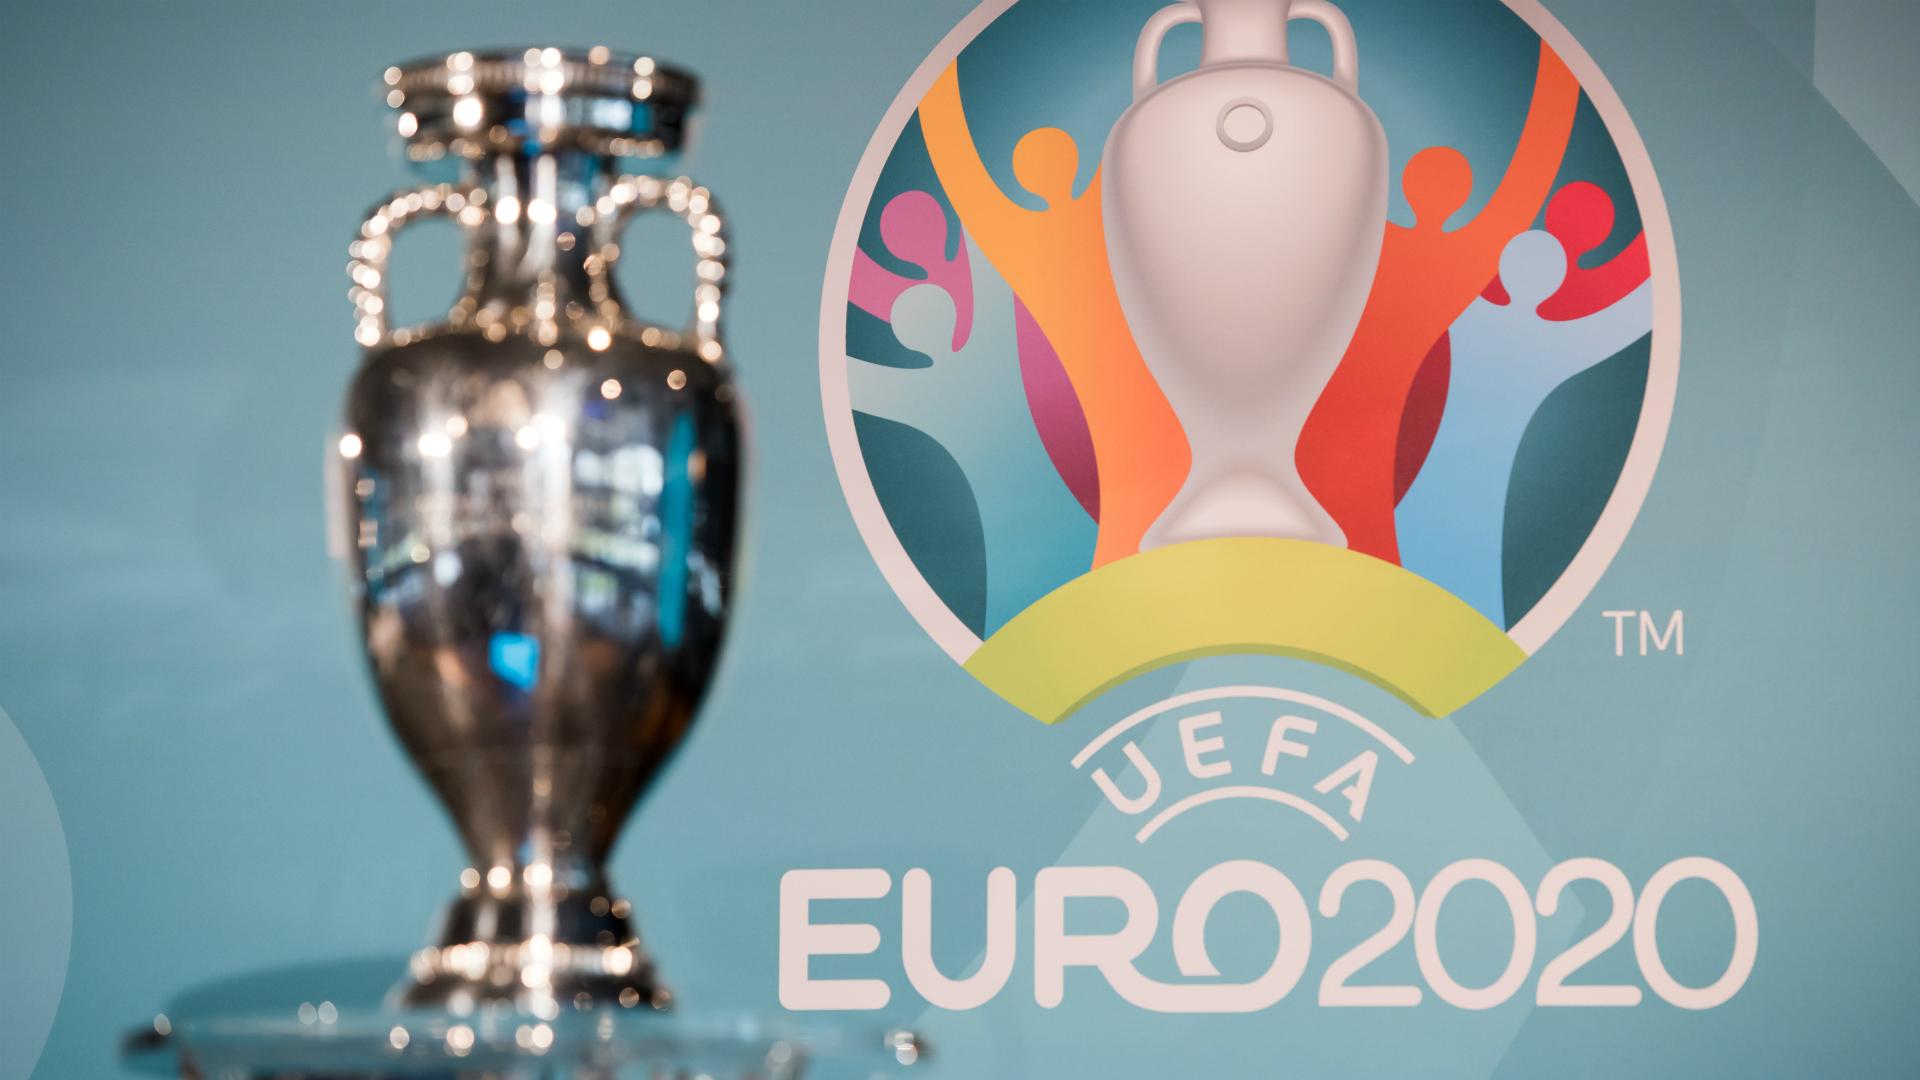 Calendario Qualificazioni Europei 2020.Qualificazioni Euro 2020 Gironi E Date Goal Com